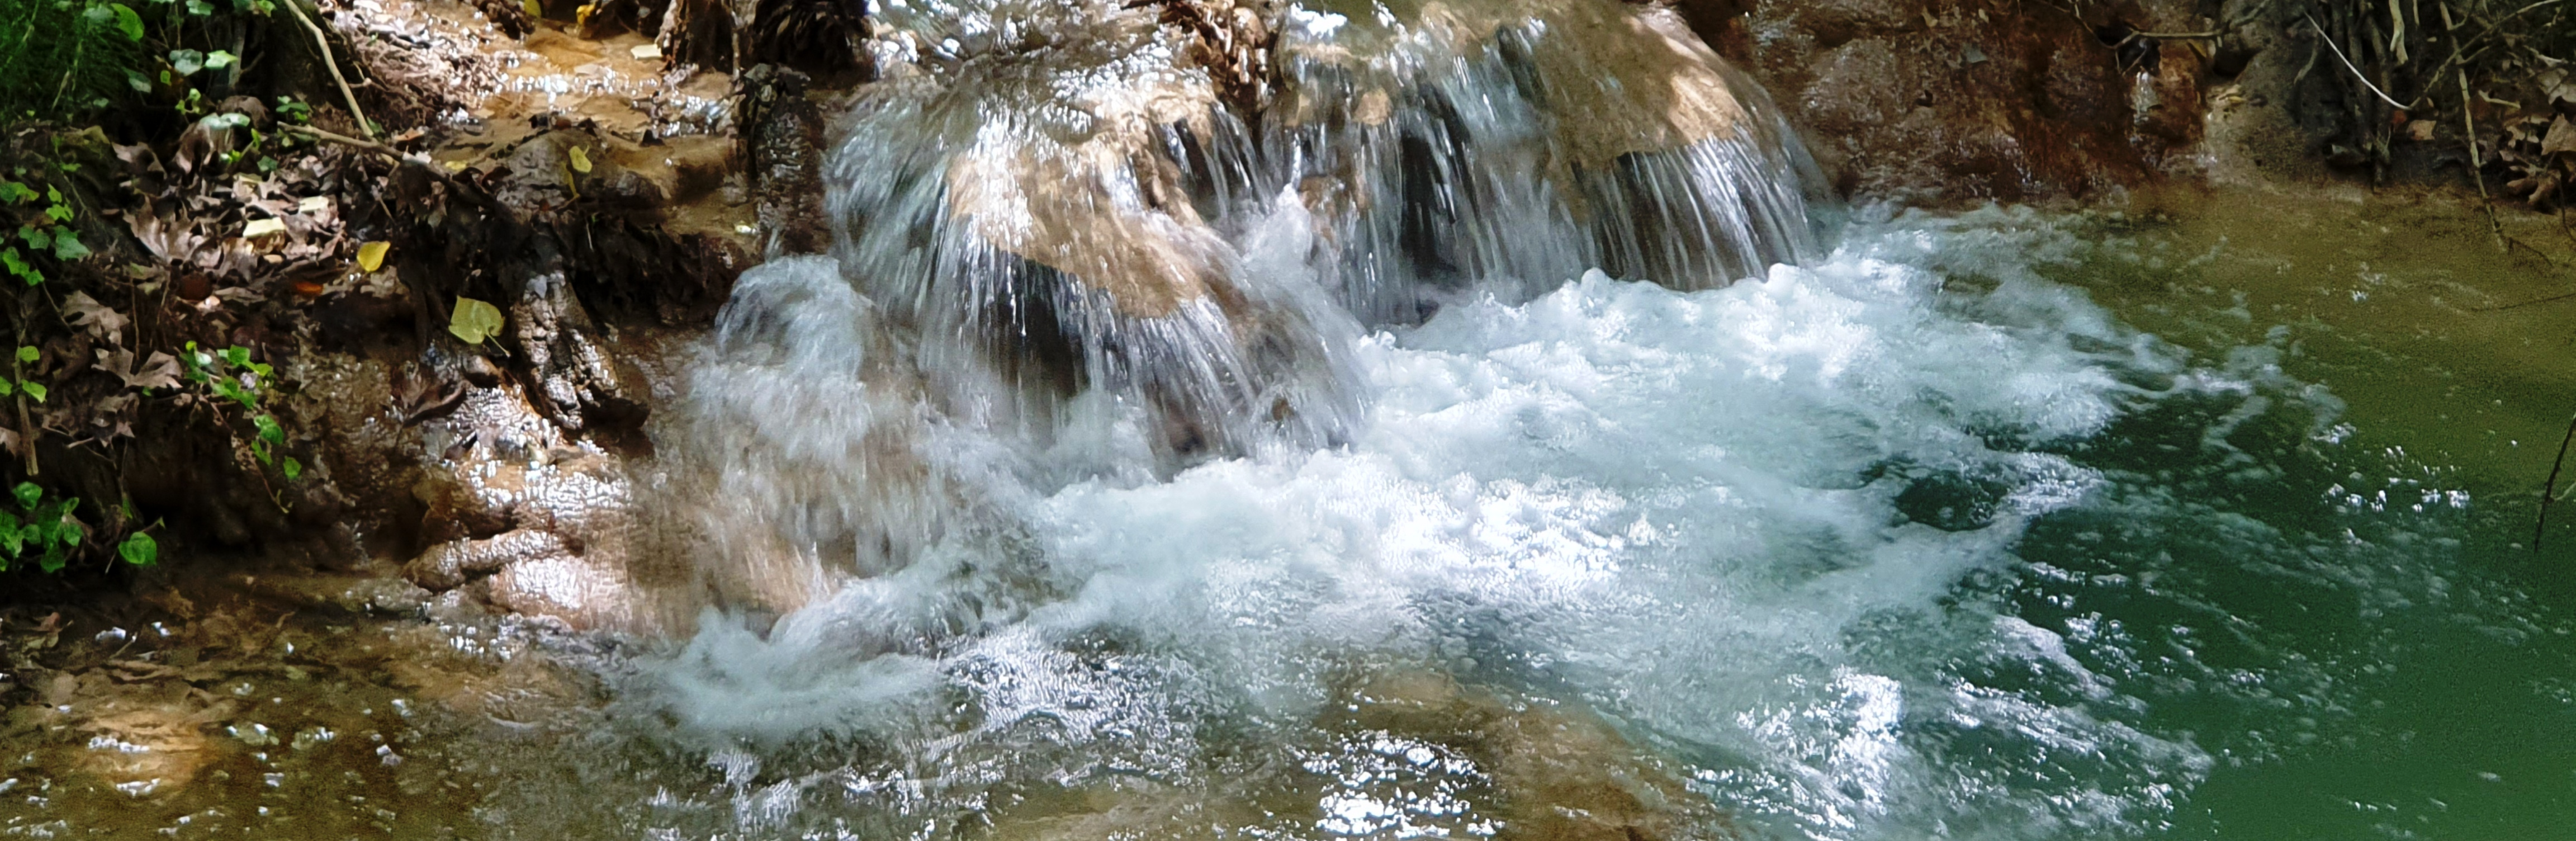 Wandeling3-Banner01-Waterfalls